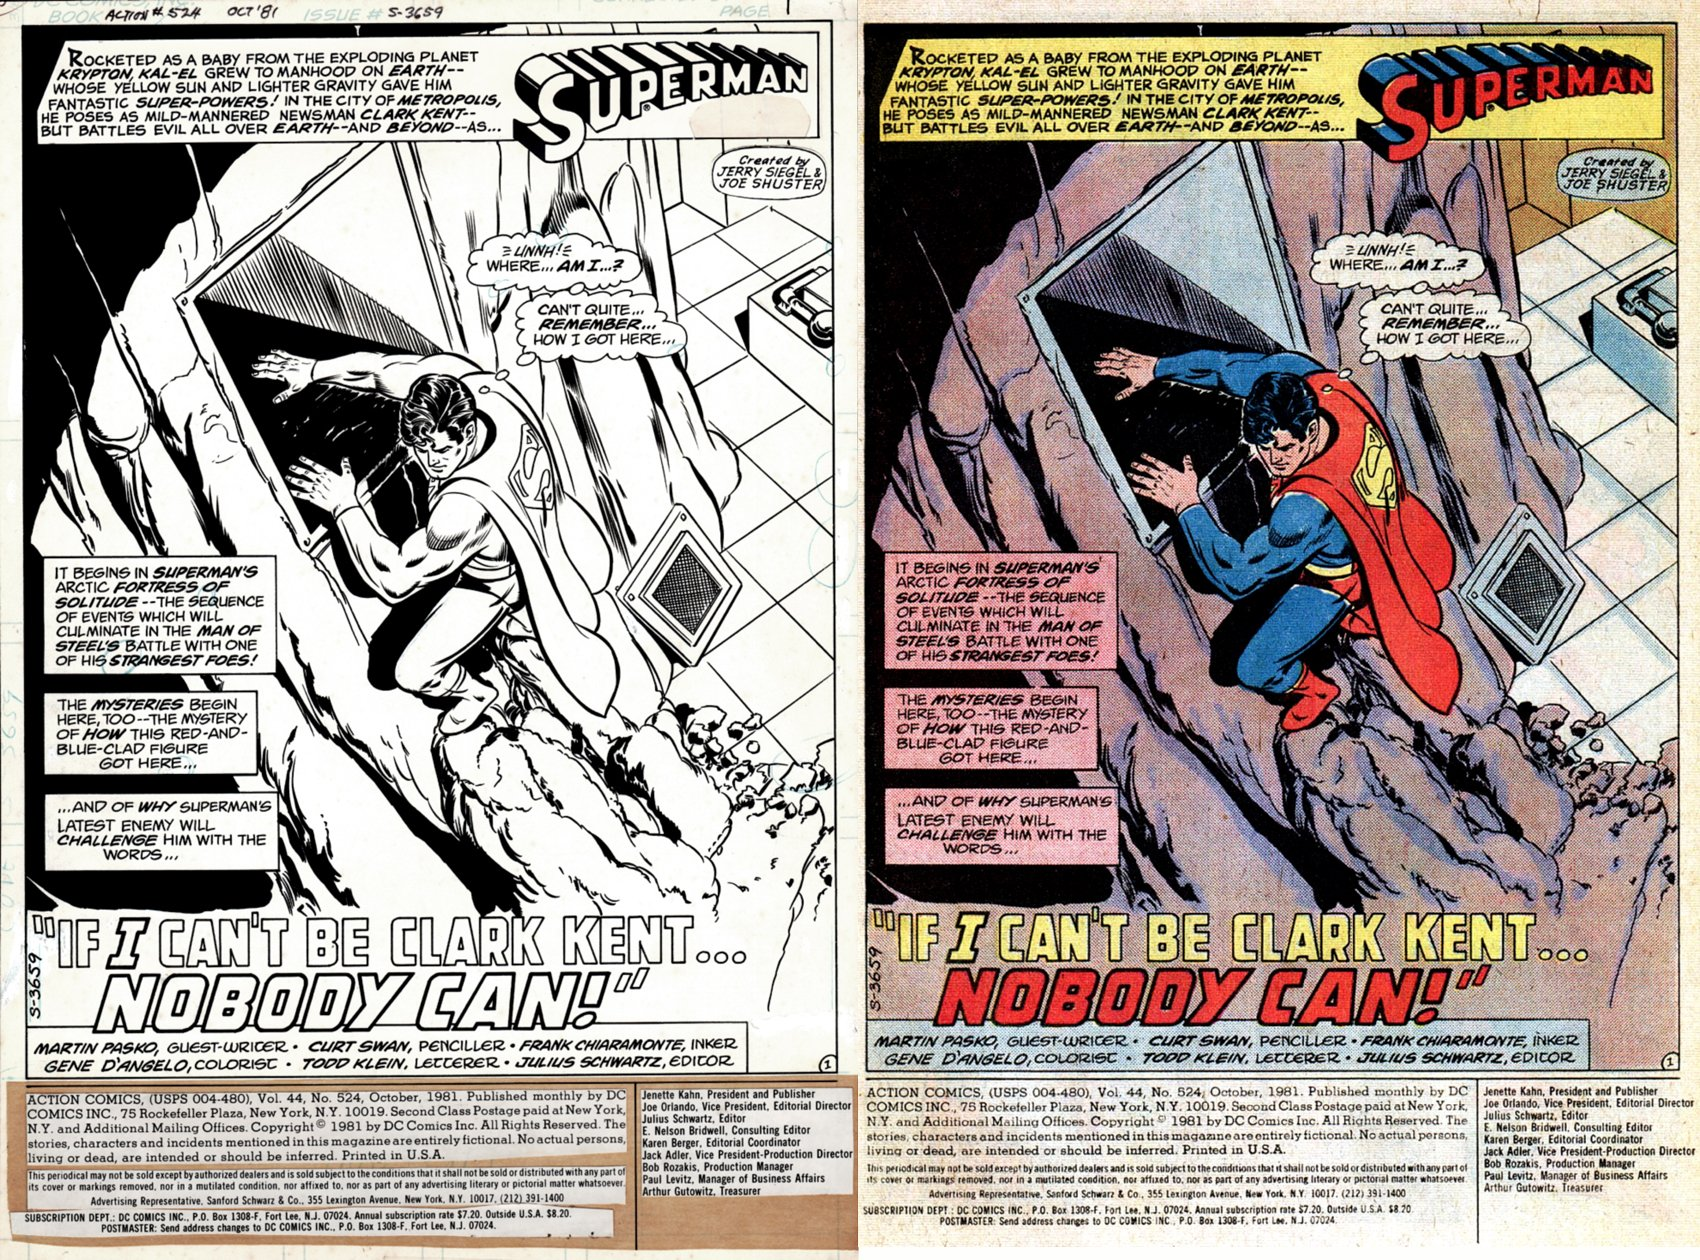 Action Comics #524 p 12 SPLASH (Superman Crawls Up The Fortress Of Solitude!) 1981